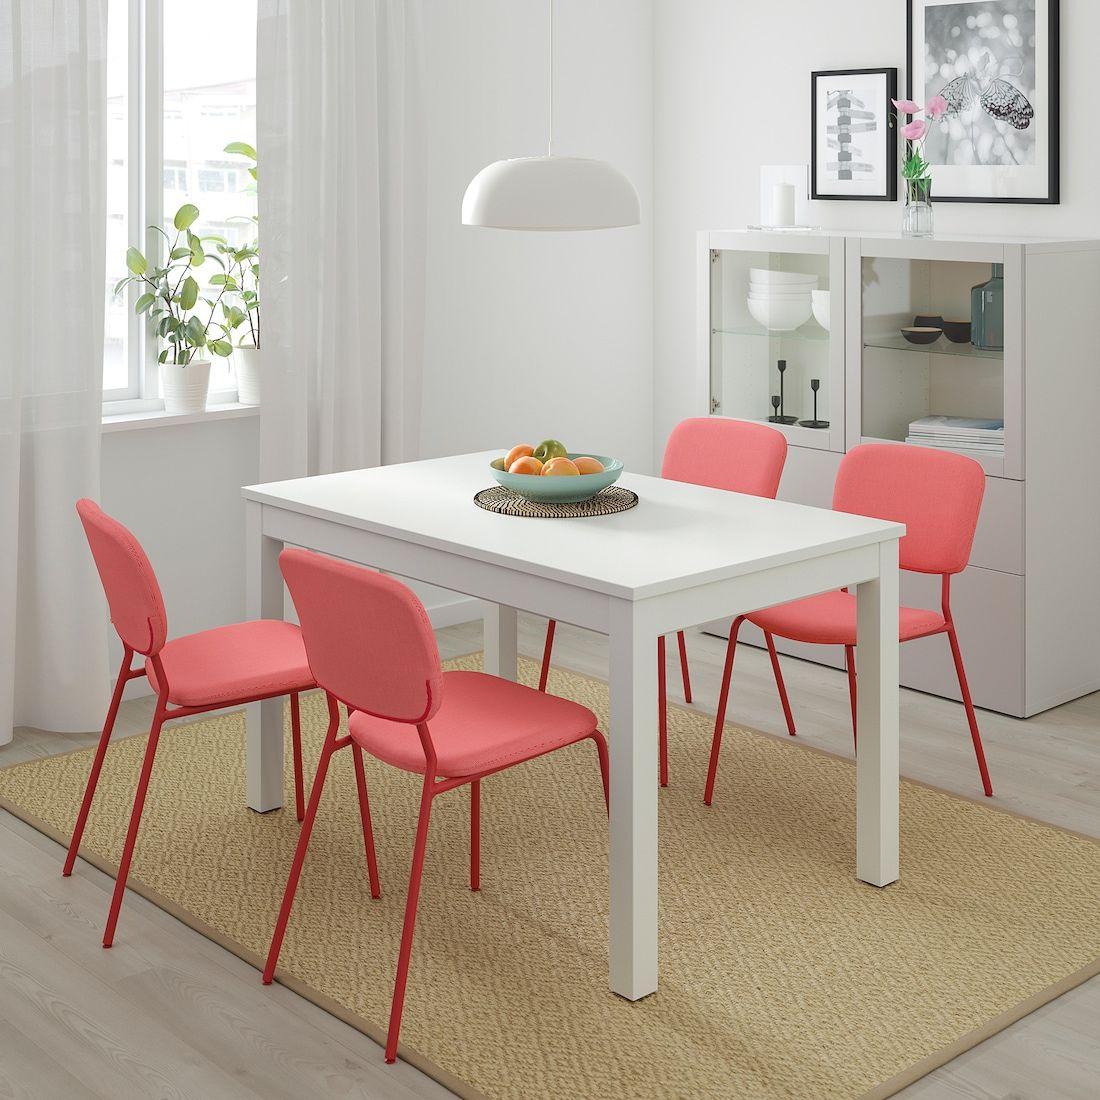 Laneberg Table Extensible Blanc 130 190x80 Cm Table Extensible